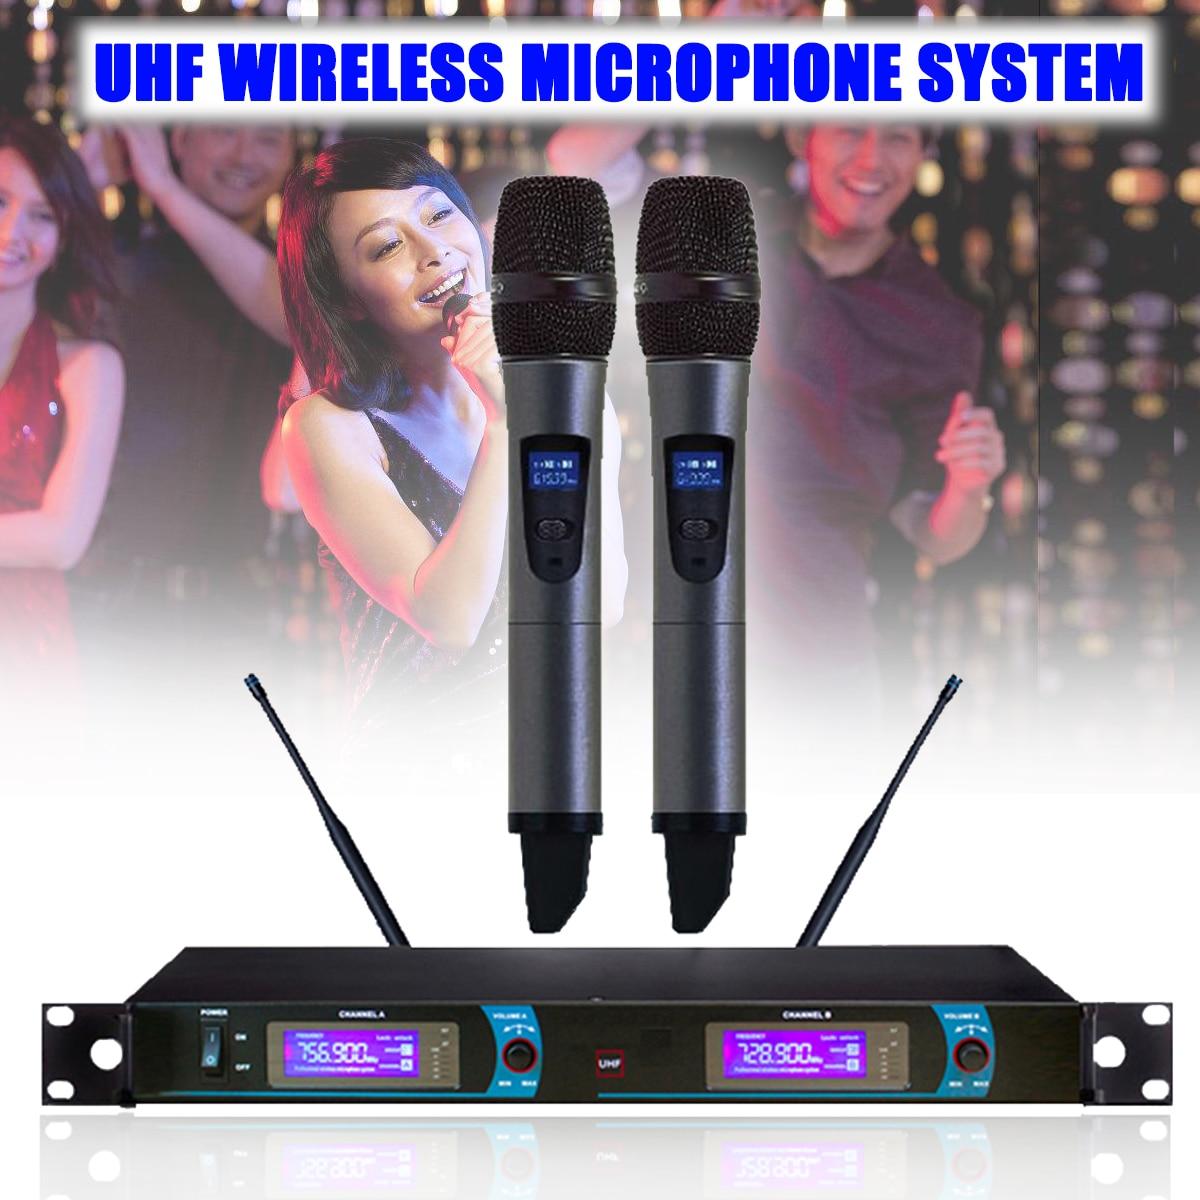 LCD Display UHF Wireless Dual Studio Microphone Mic System Home KTV Karaoke DJ Wireless Microphone Profesional for Computer dual uhf handheld wireless microphone lcd audio system 2 mic for karaoke ktv